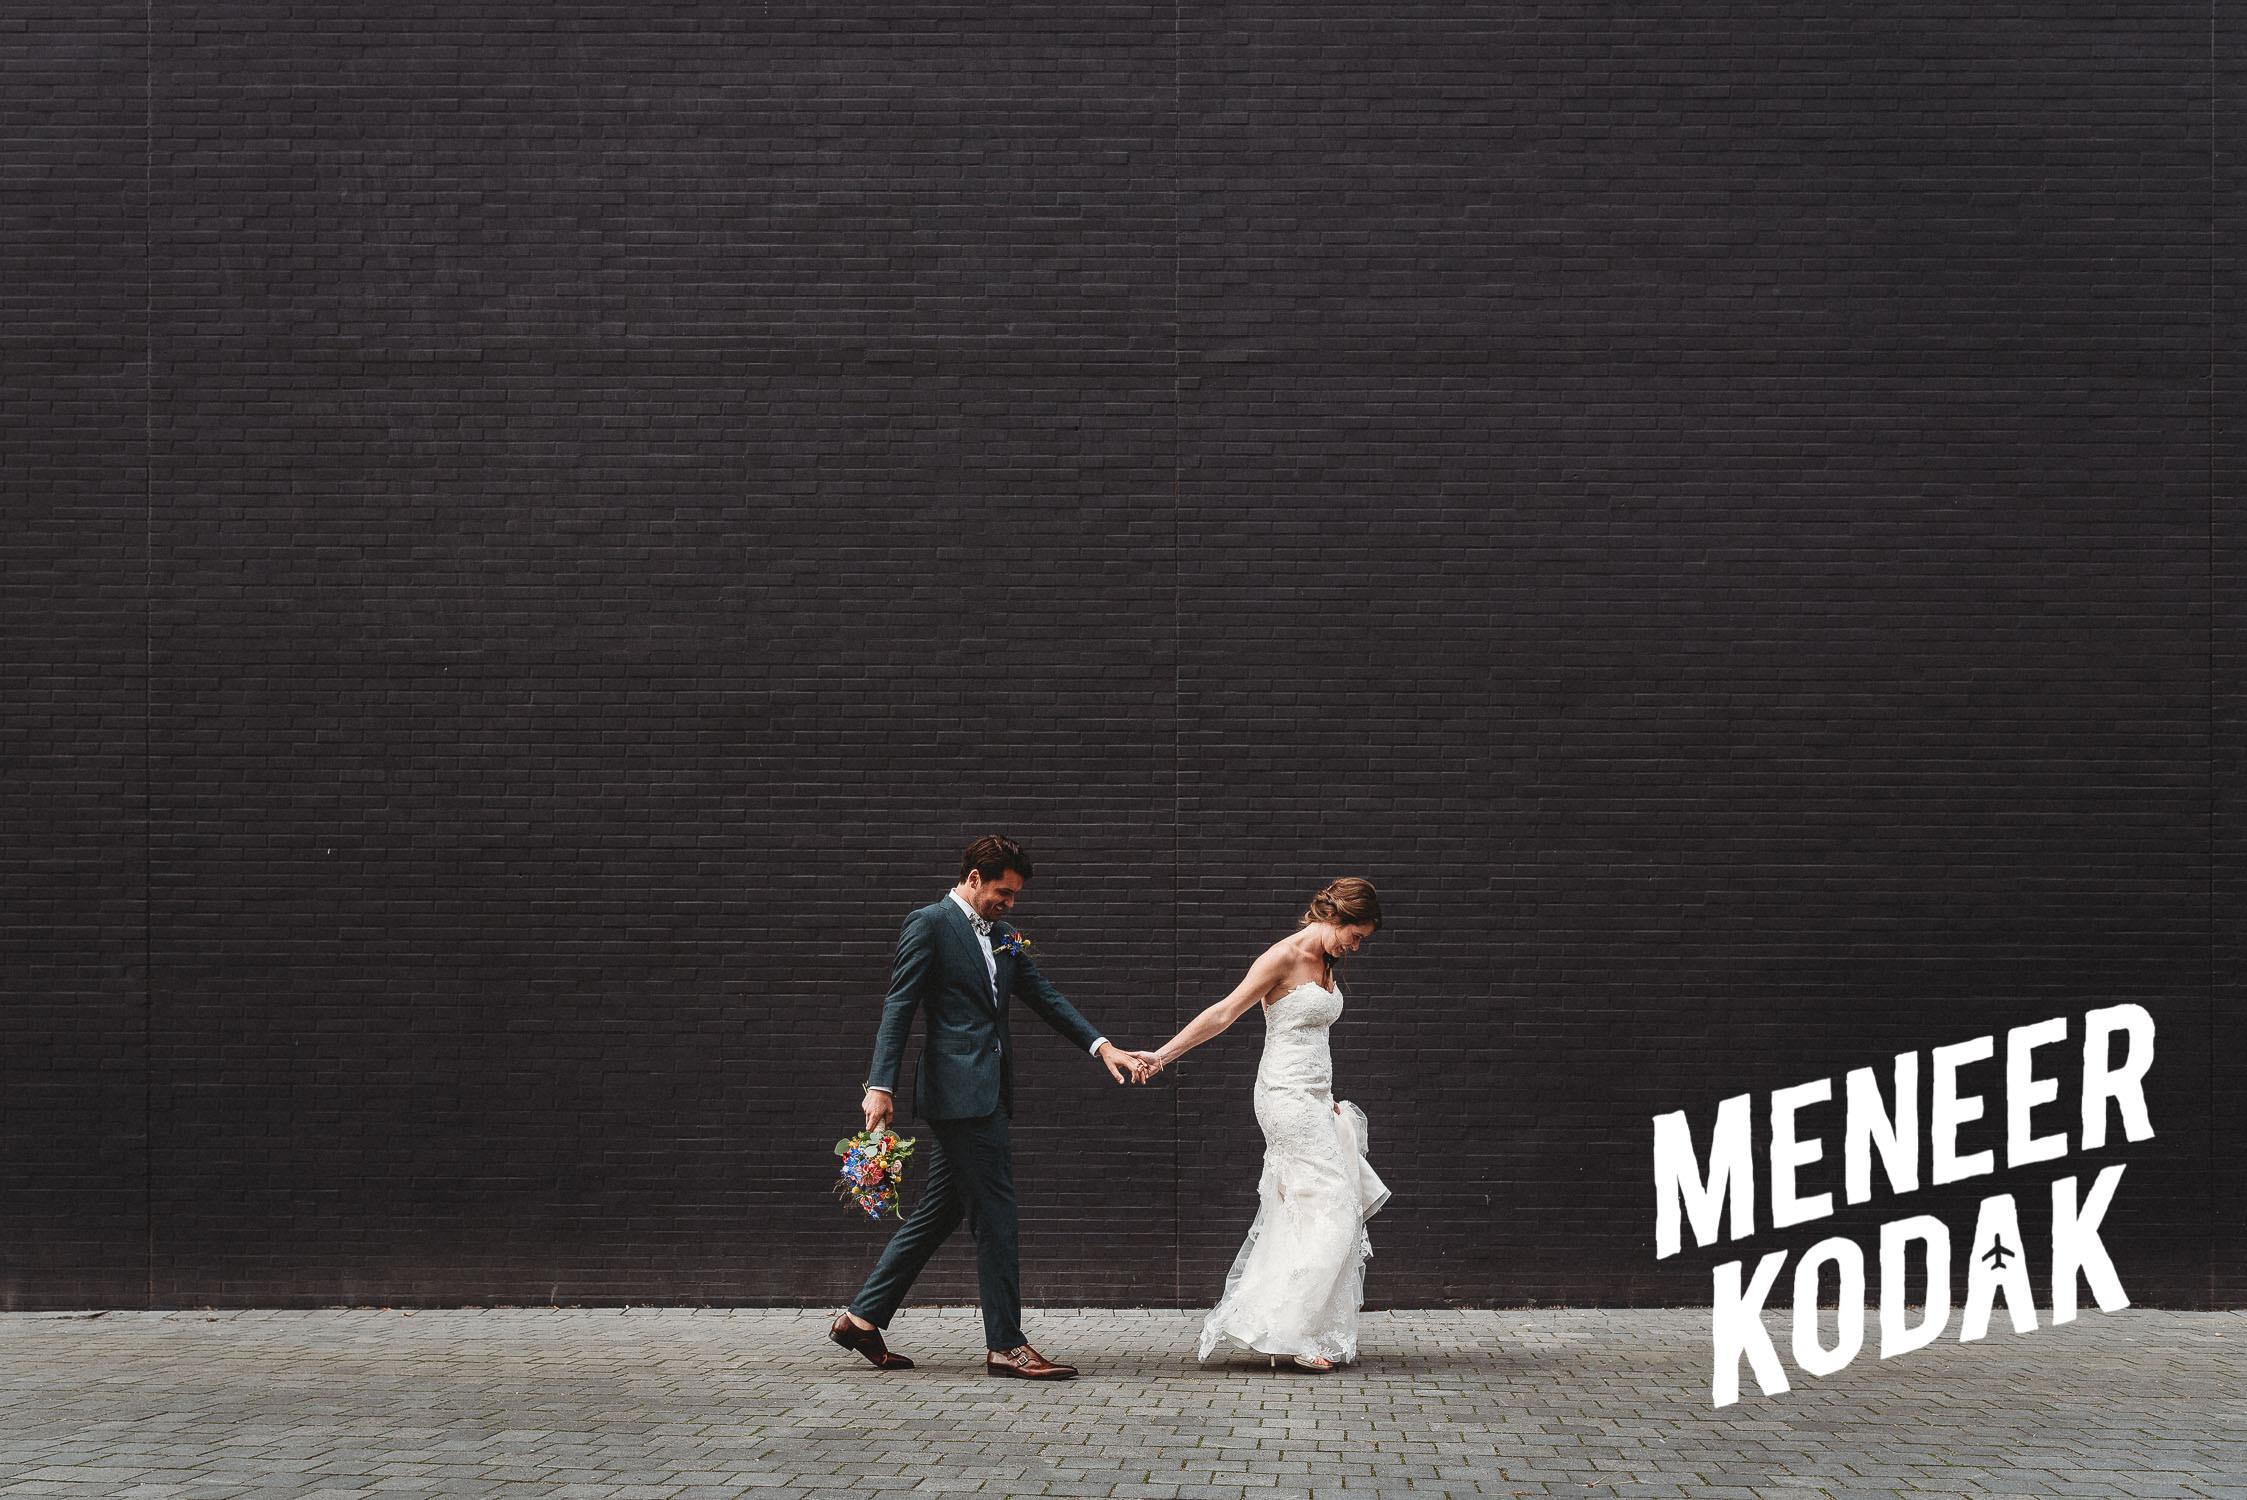 Meneer Kodak - Trouwreportage - Breda - E&M-084.jpg